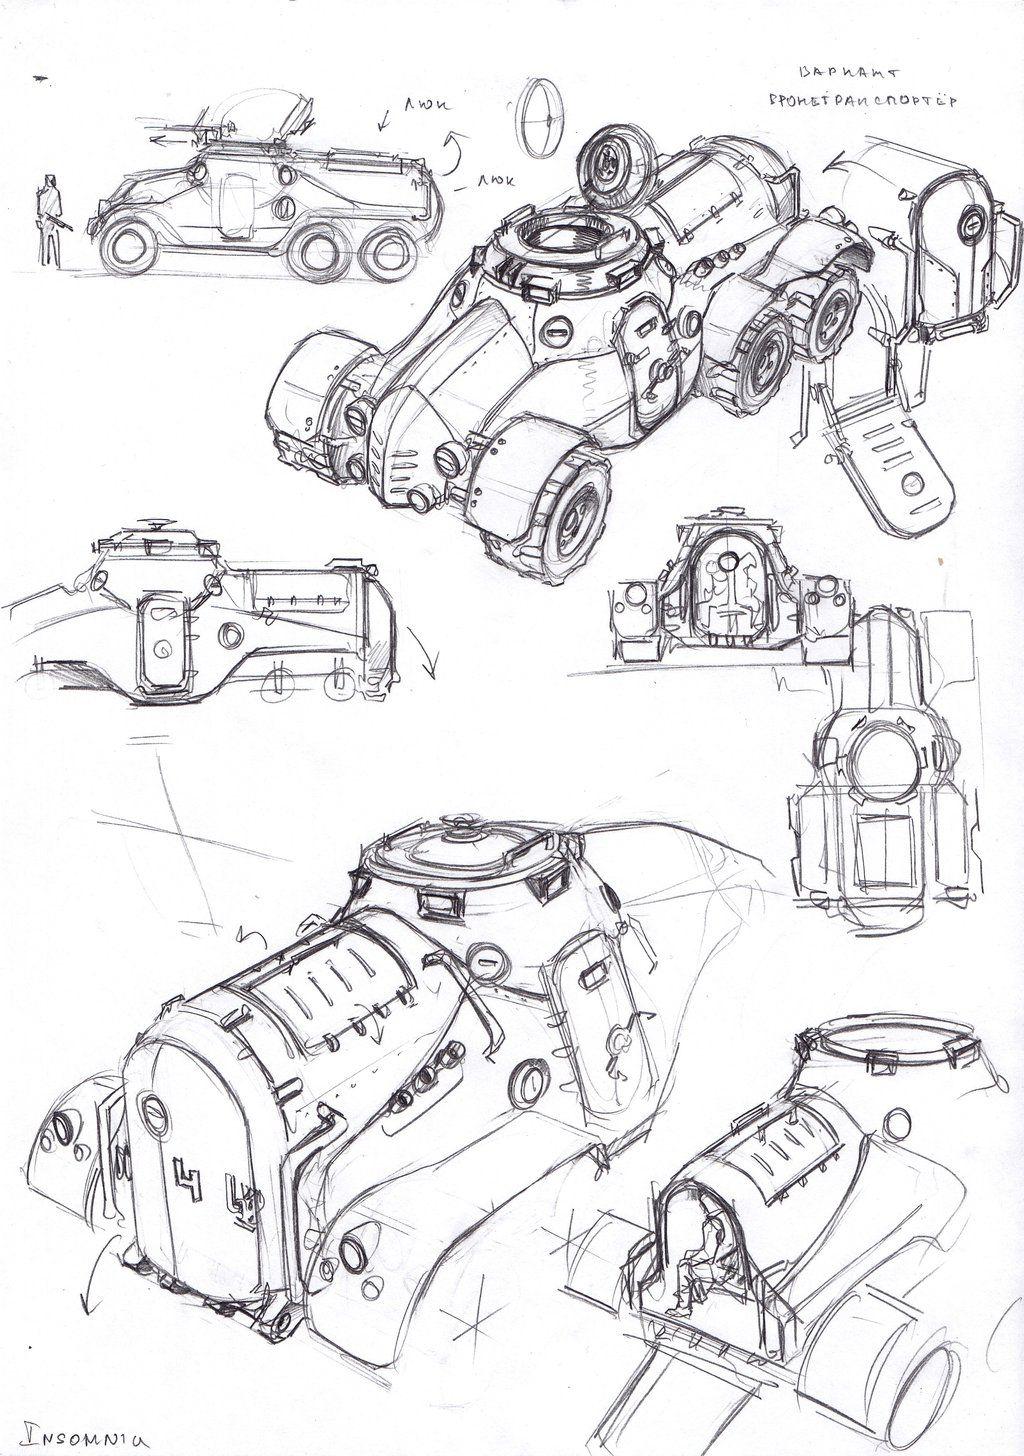 APC 2 by TugoDoomER on DeviantArt | Industrial Design in